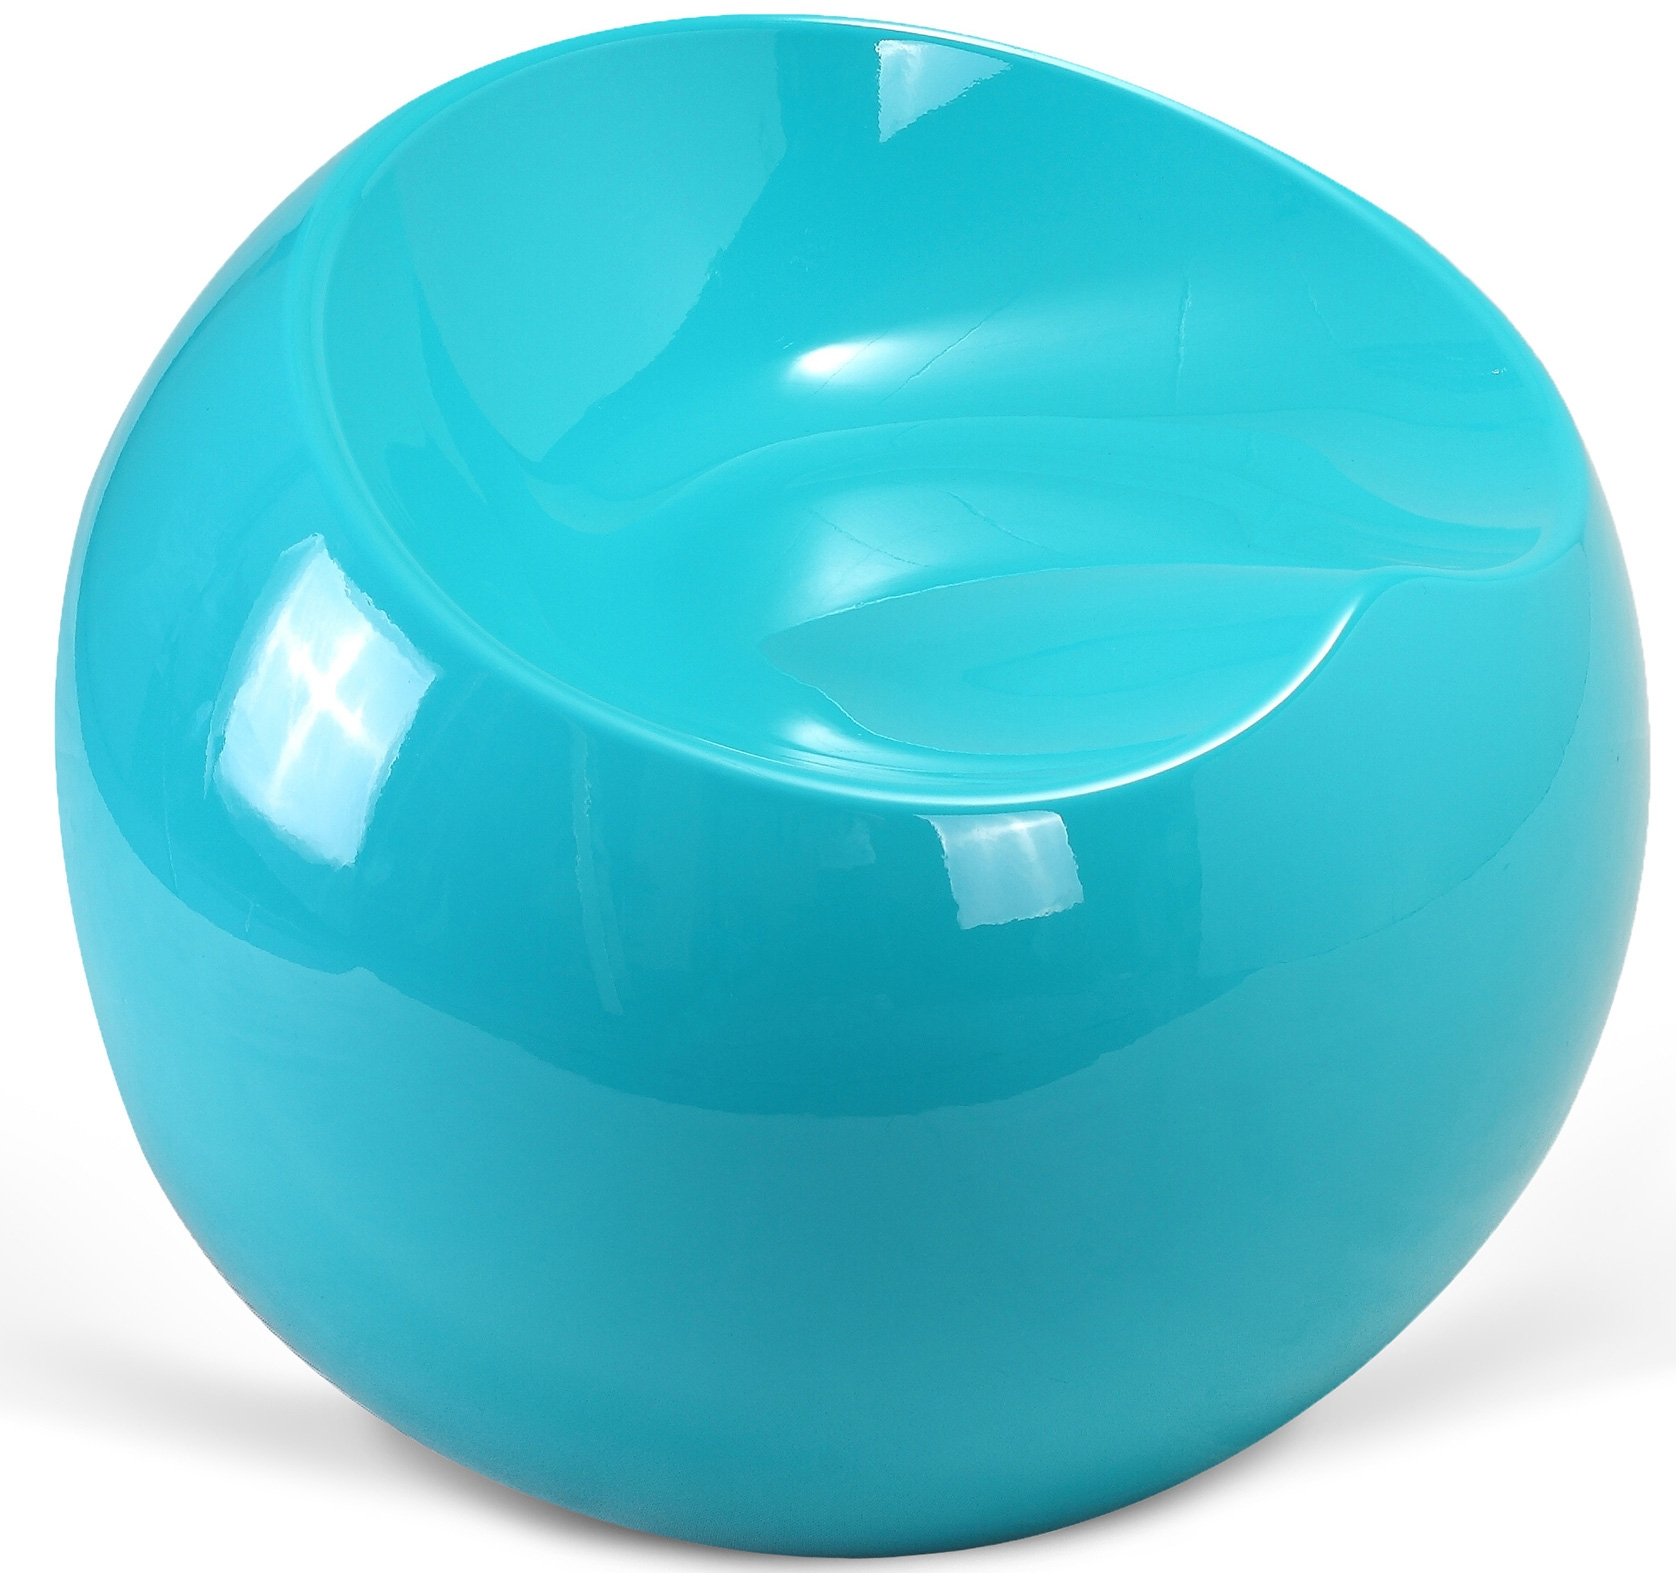 fauteuil boule turquoise brillant inspir finn stone. Black Bedroom Furniture Sets. Home Design Ideas